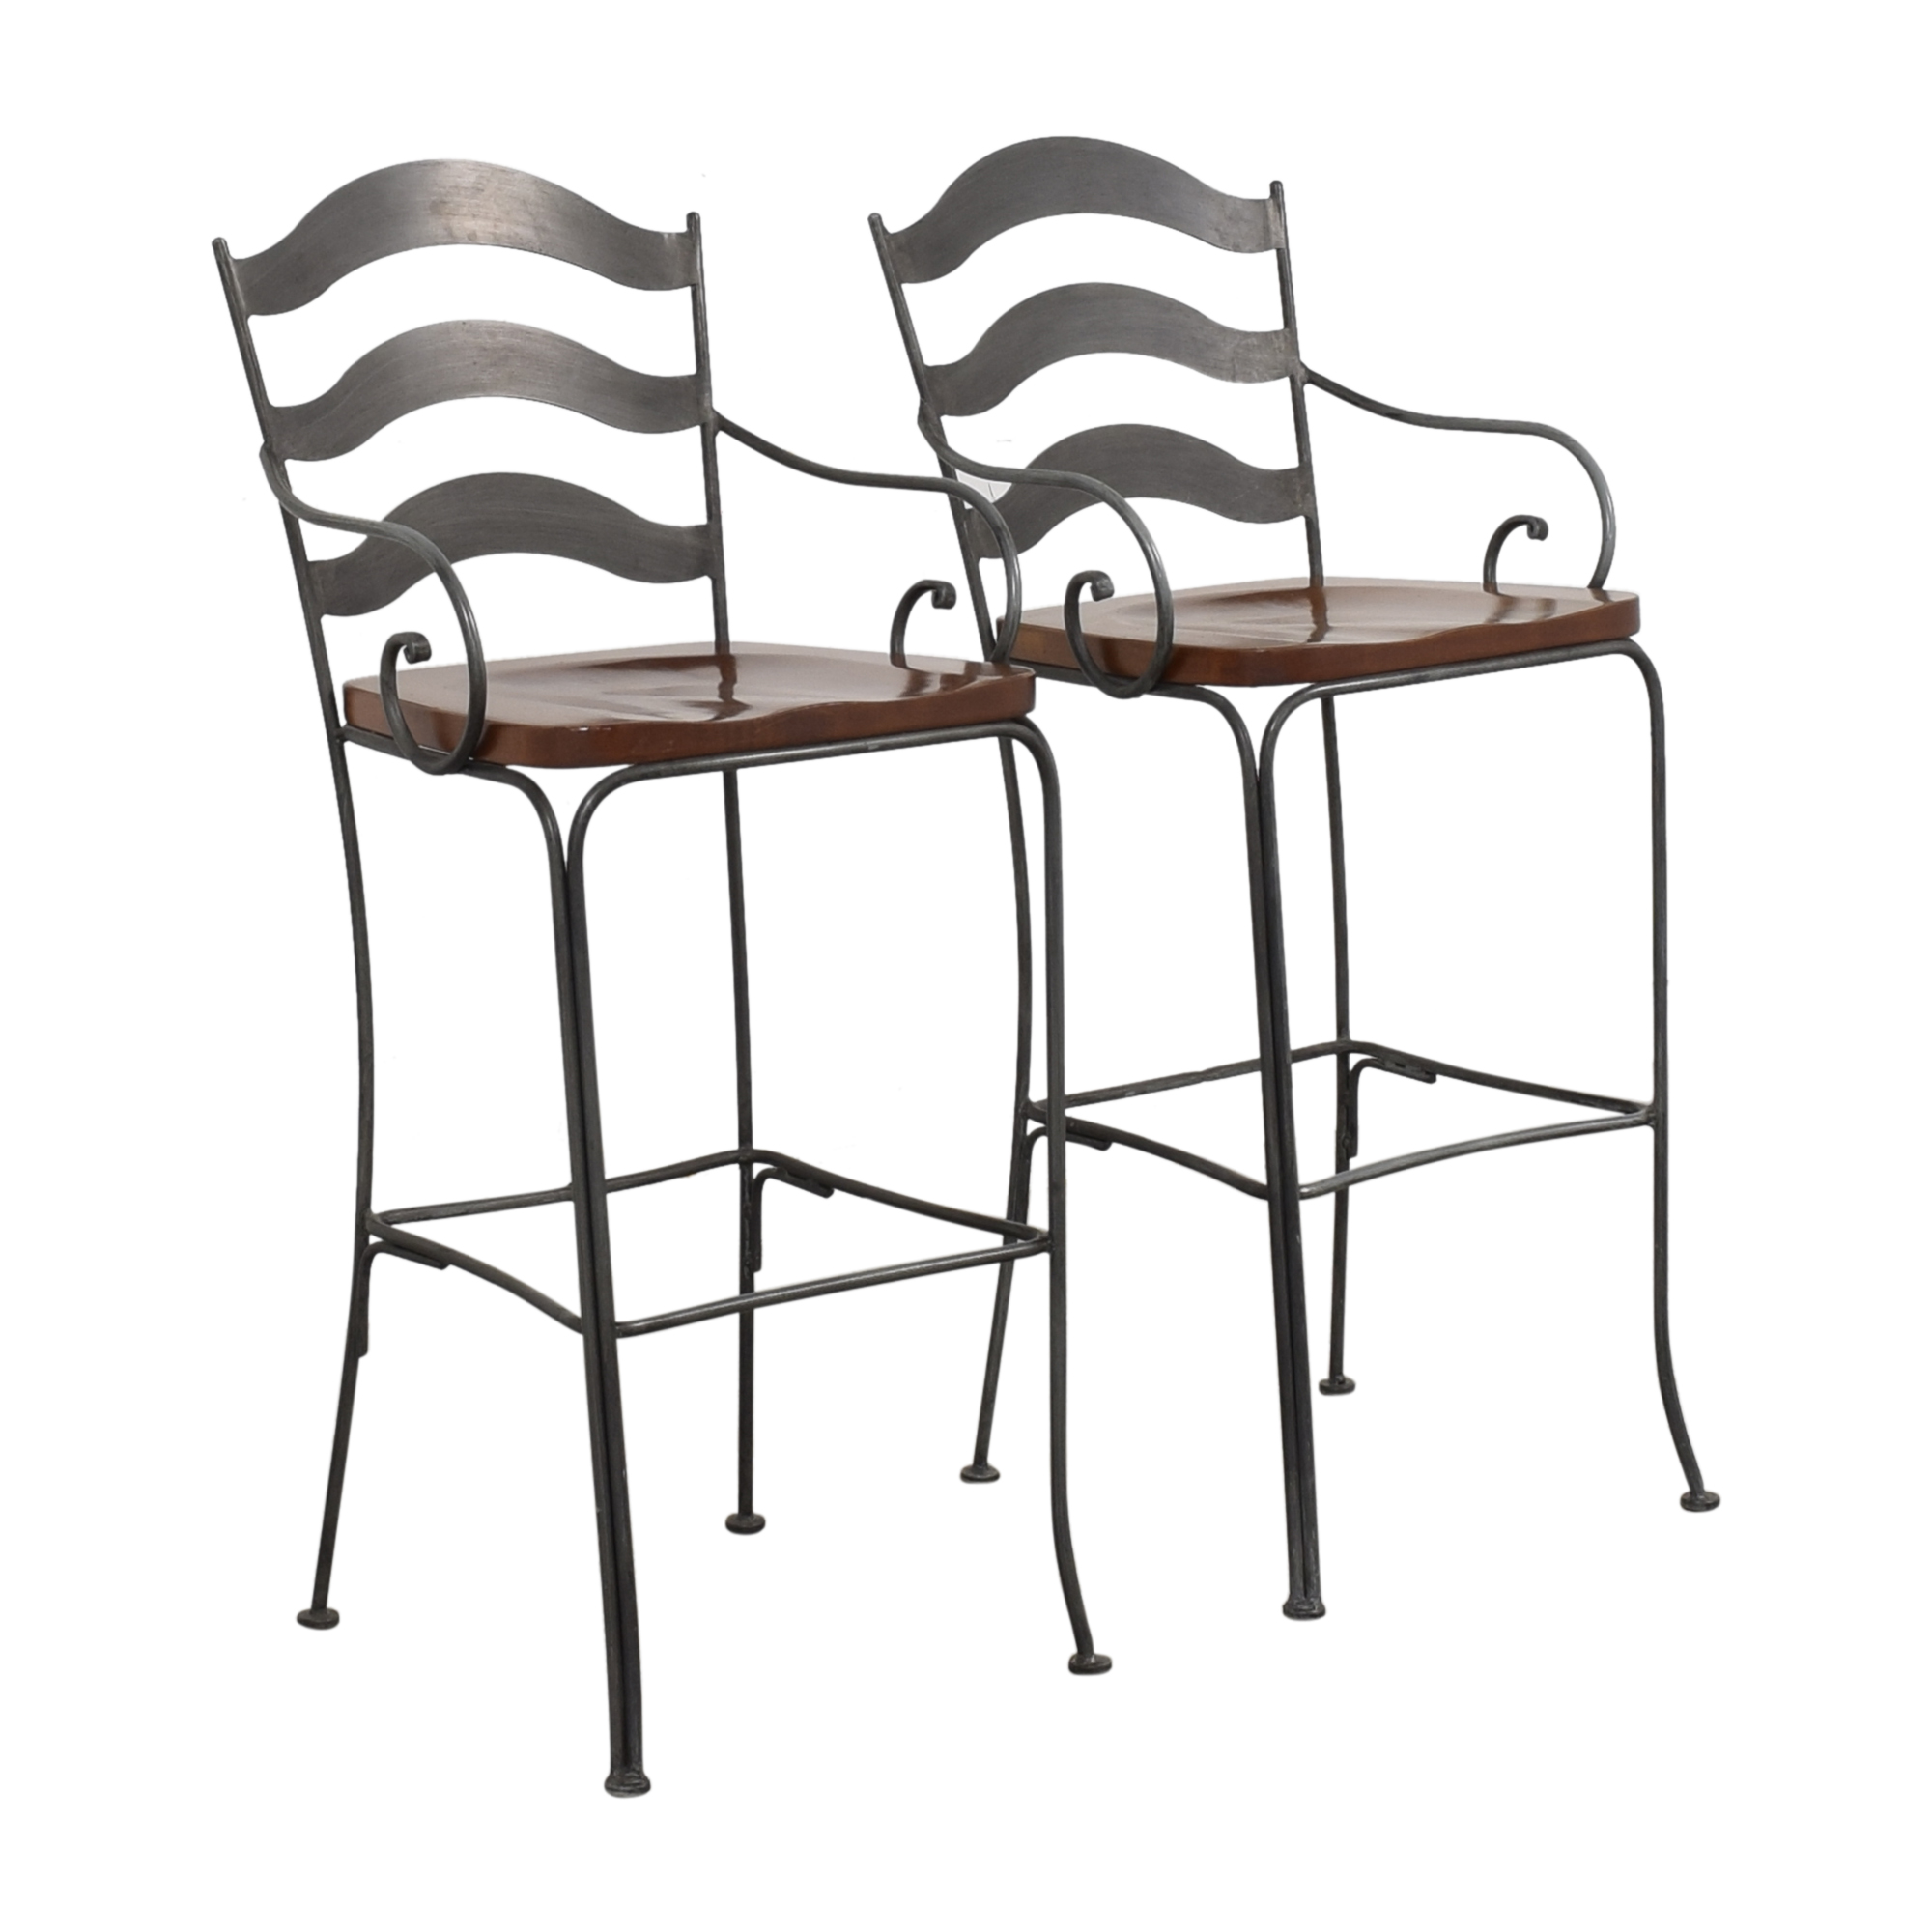 Ethan Allen Ethan Allen Legacy Russet Bar Stools Chairs